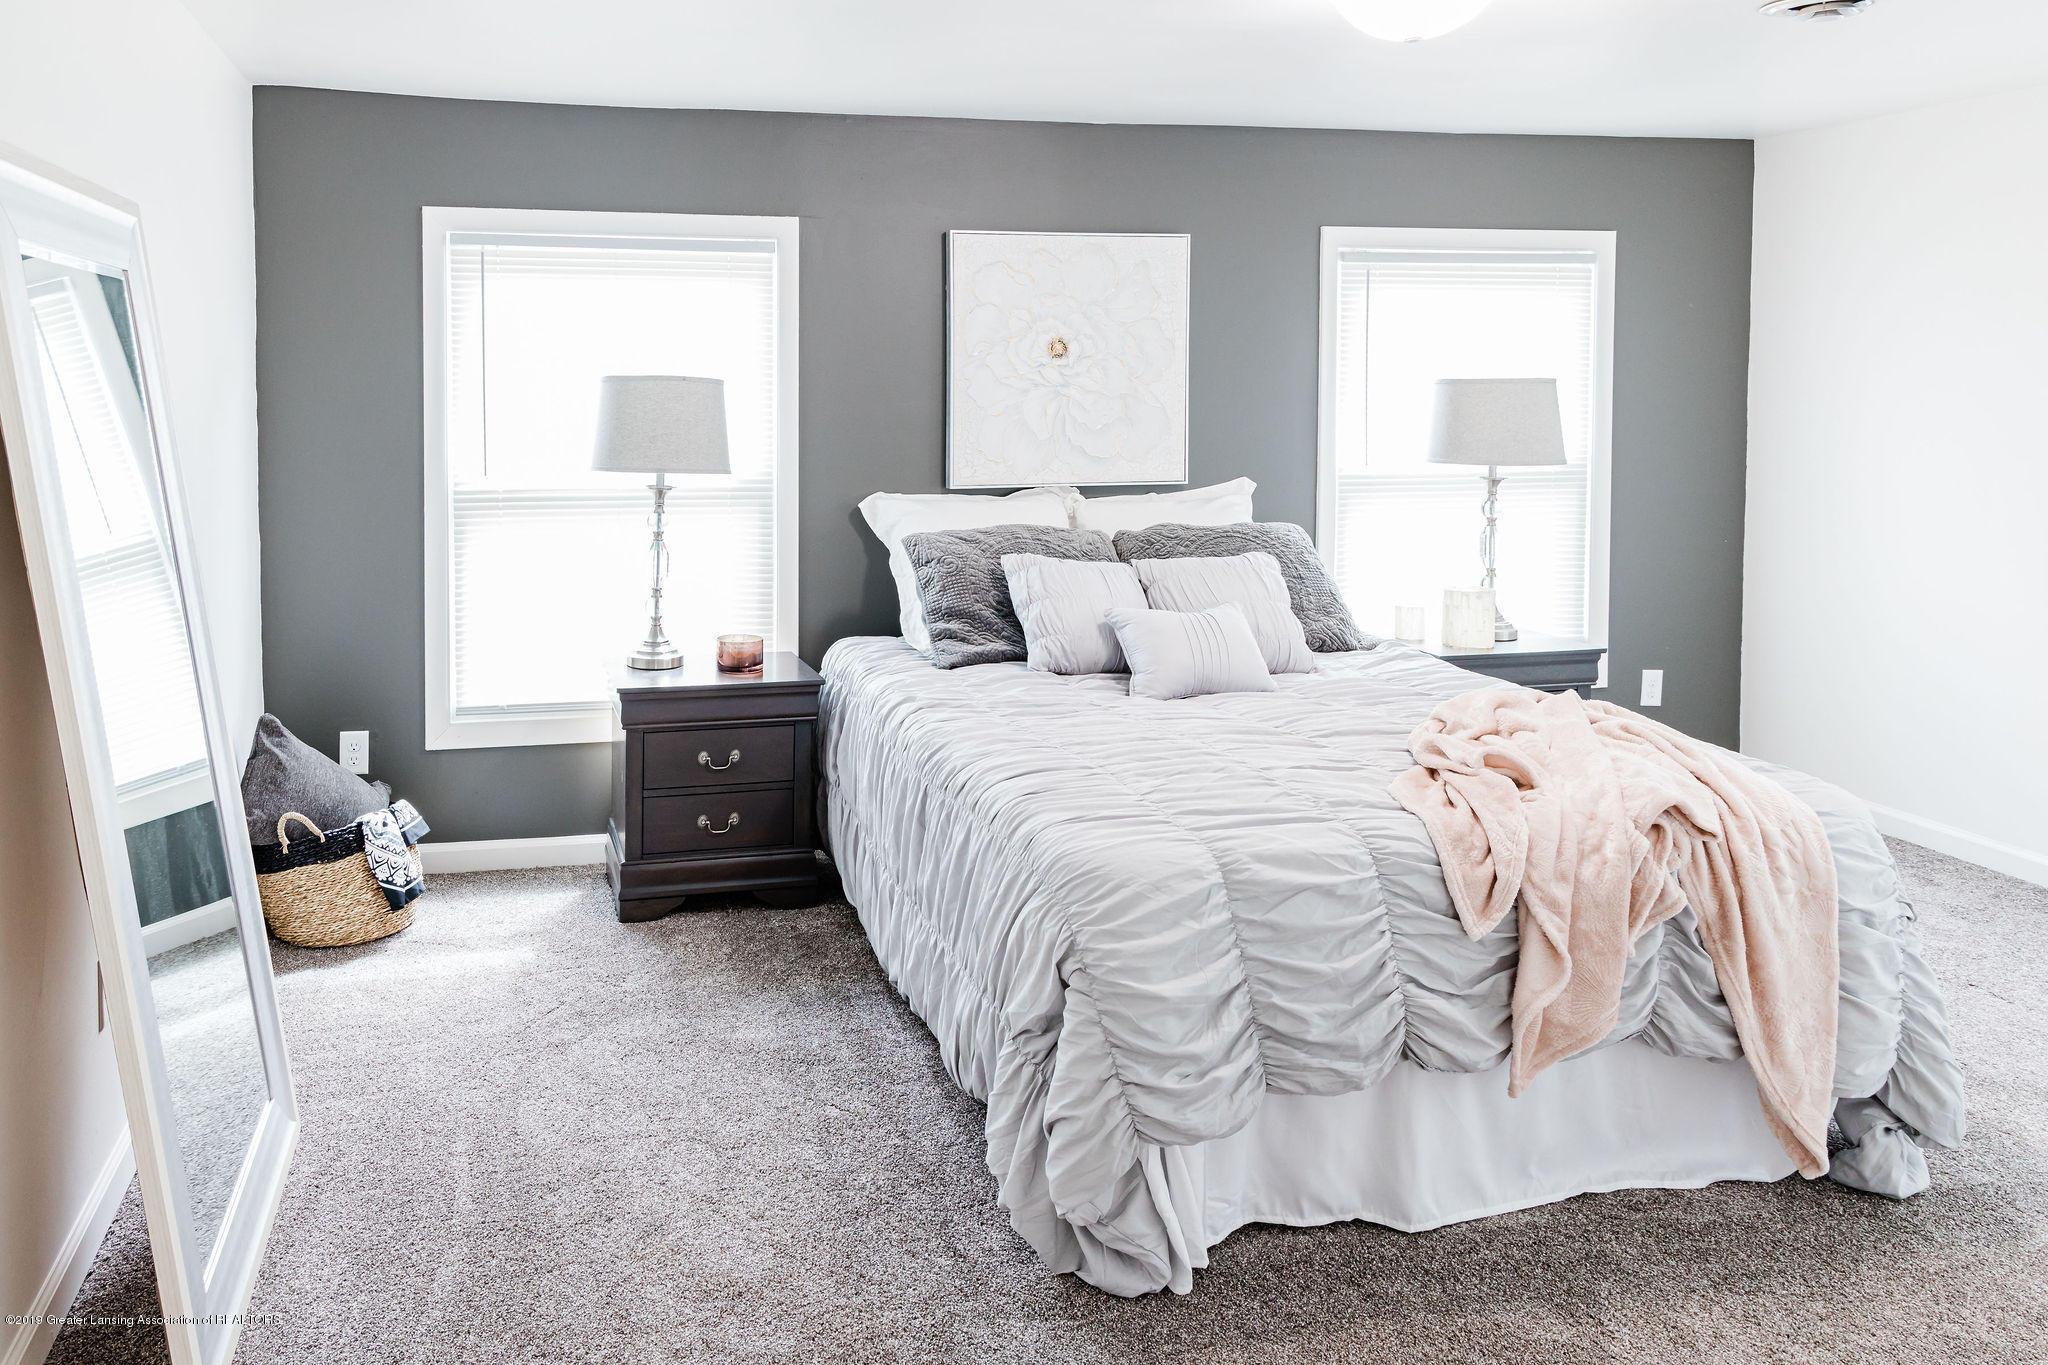 515 Beechwood St - Master Bedroom - 40